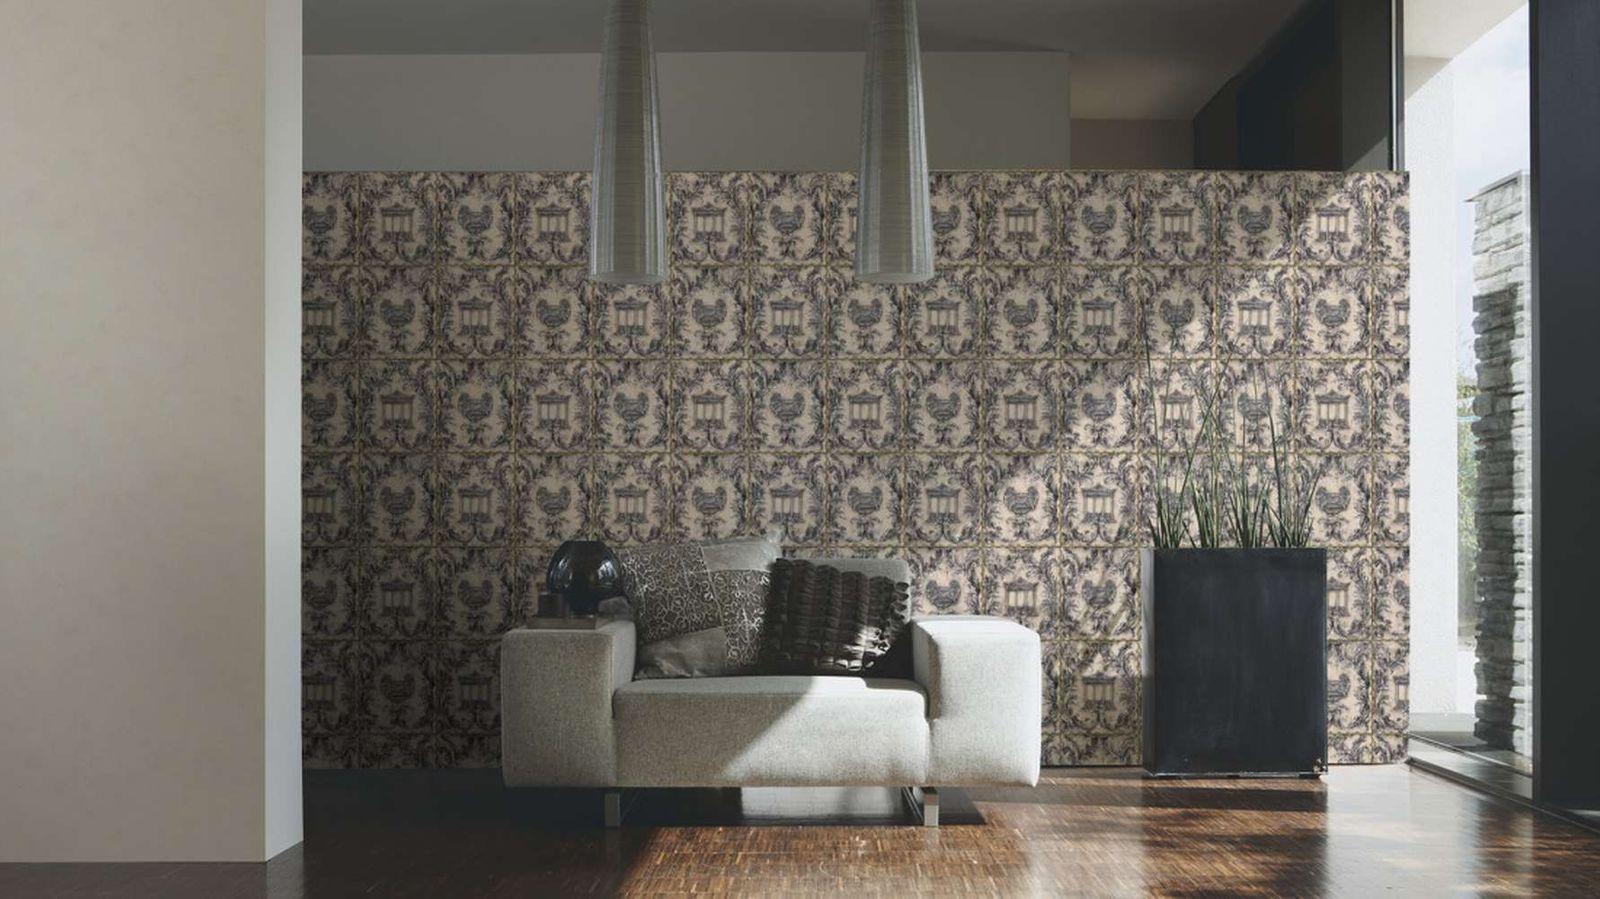 tapete wolfgang joop antik tempel silber glitzer 34086 2. Black Bedroom Furniture Sets. Home Design Ideas